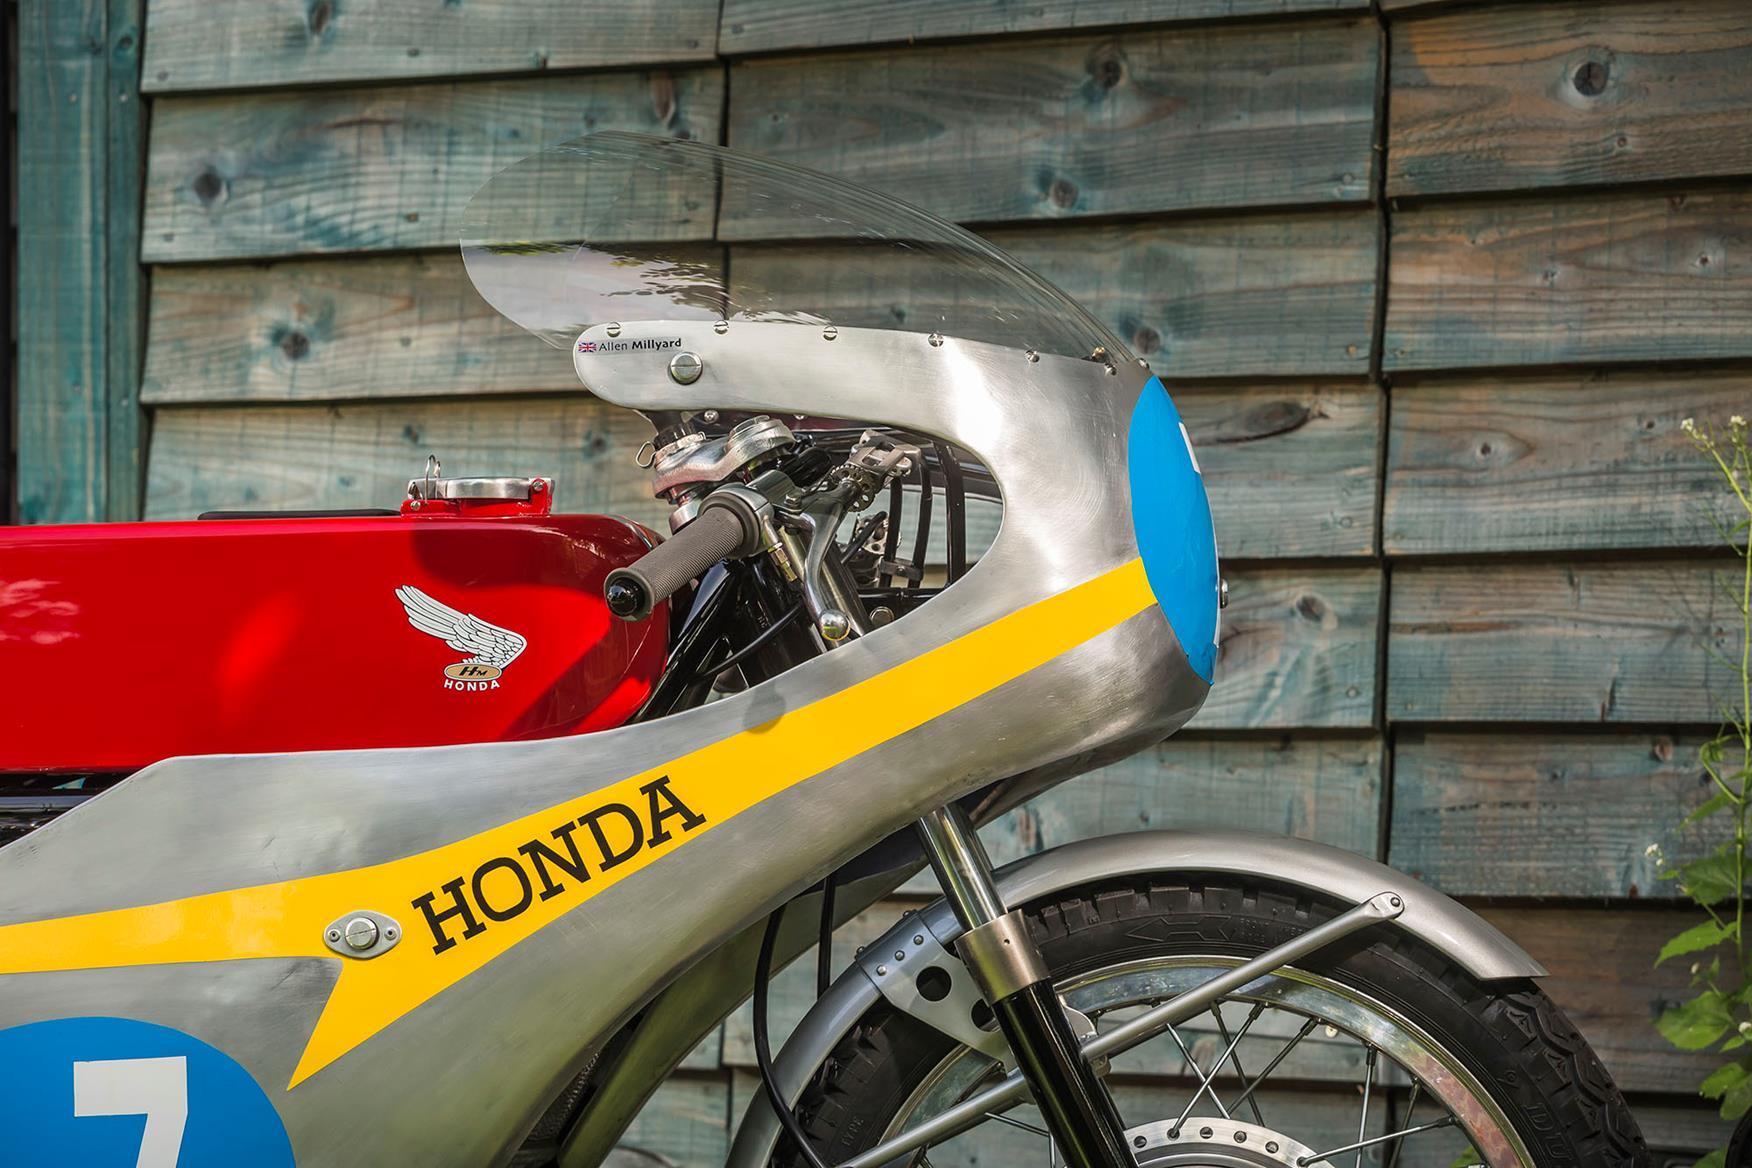 The hand-beaten fairing on Allen Millyard's Honda Six